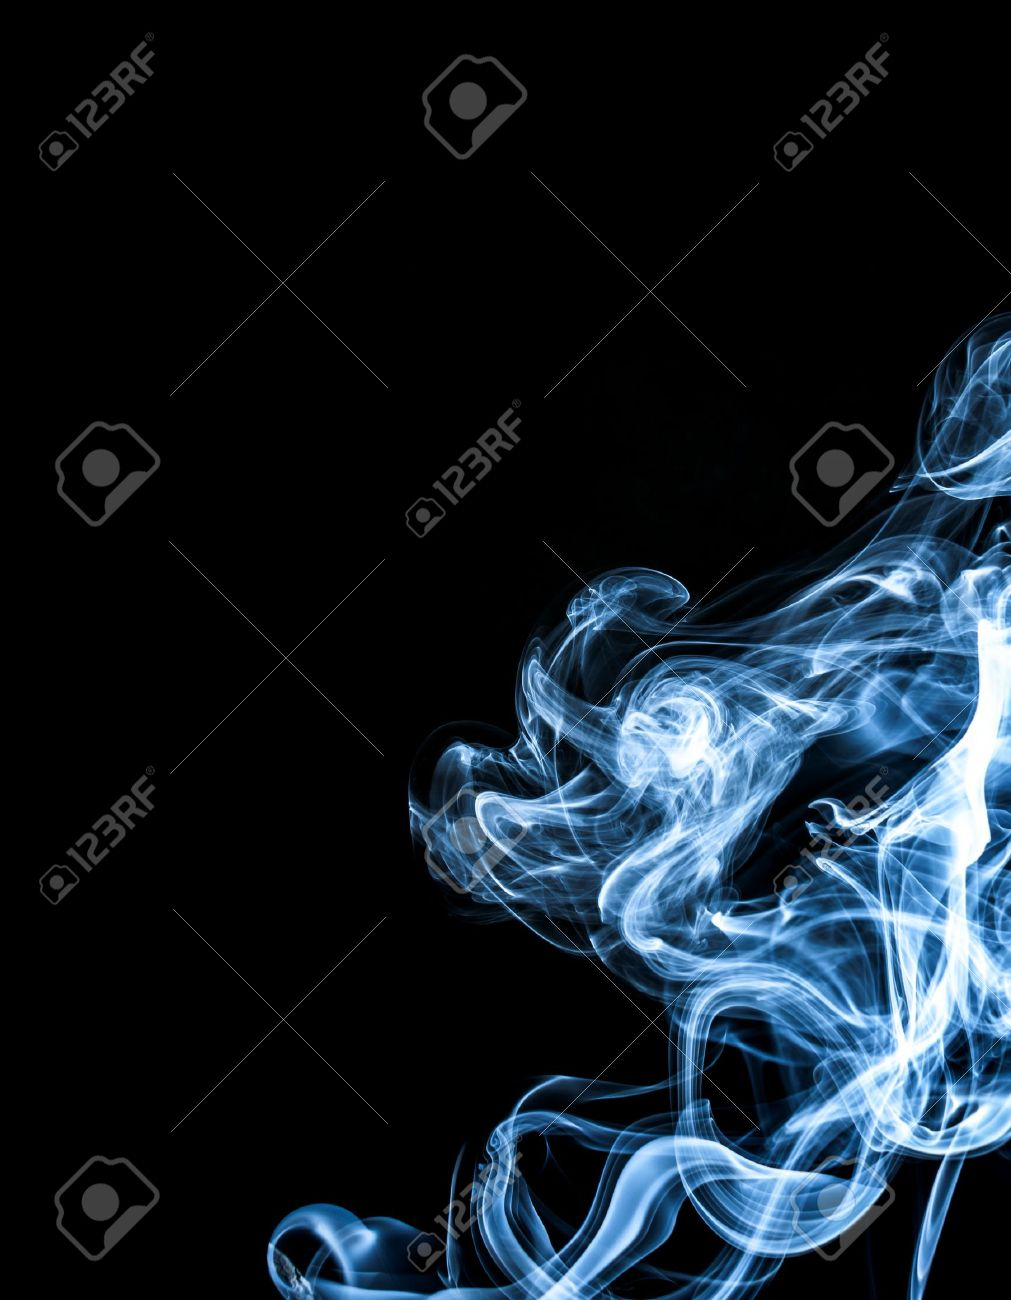 White smoke  on black background Stock Photo - 15417002